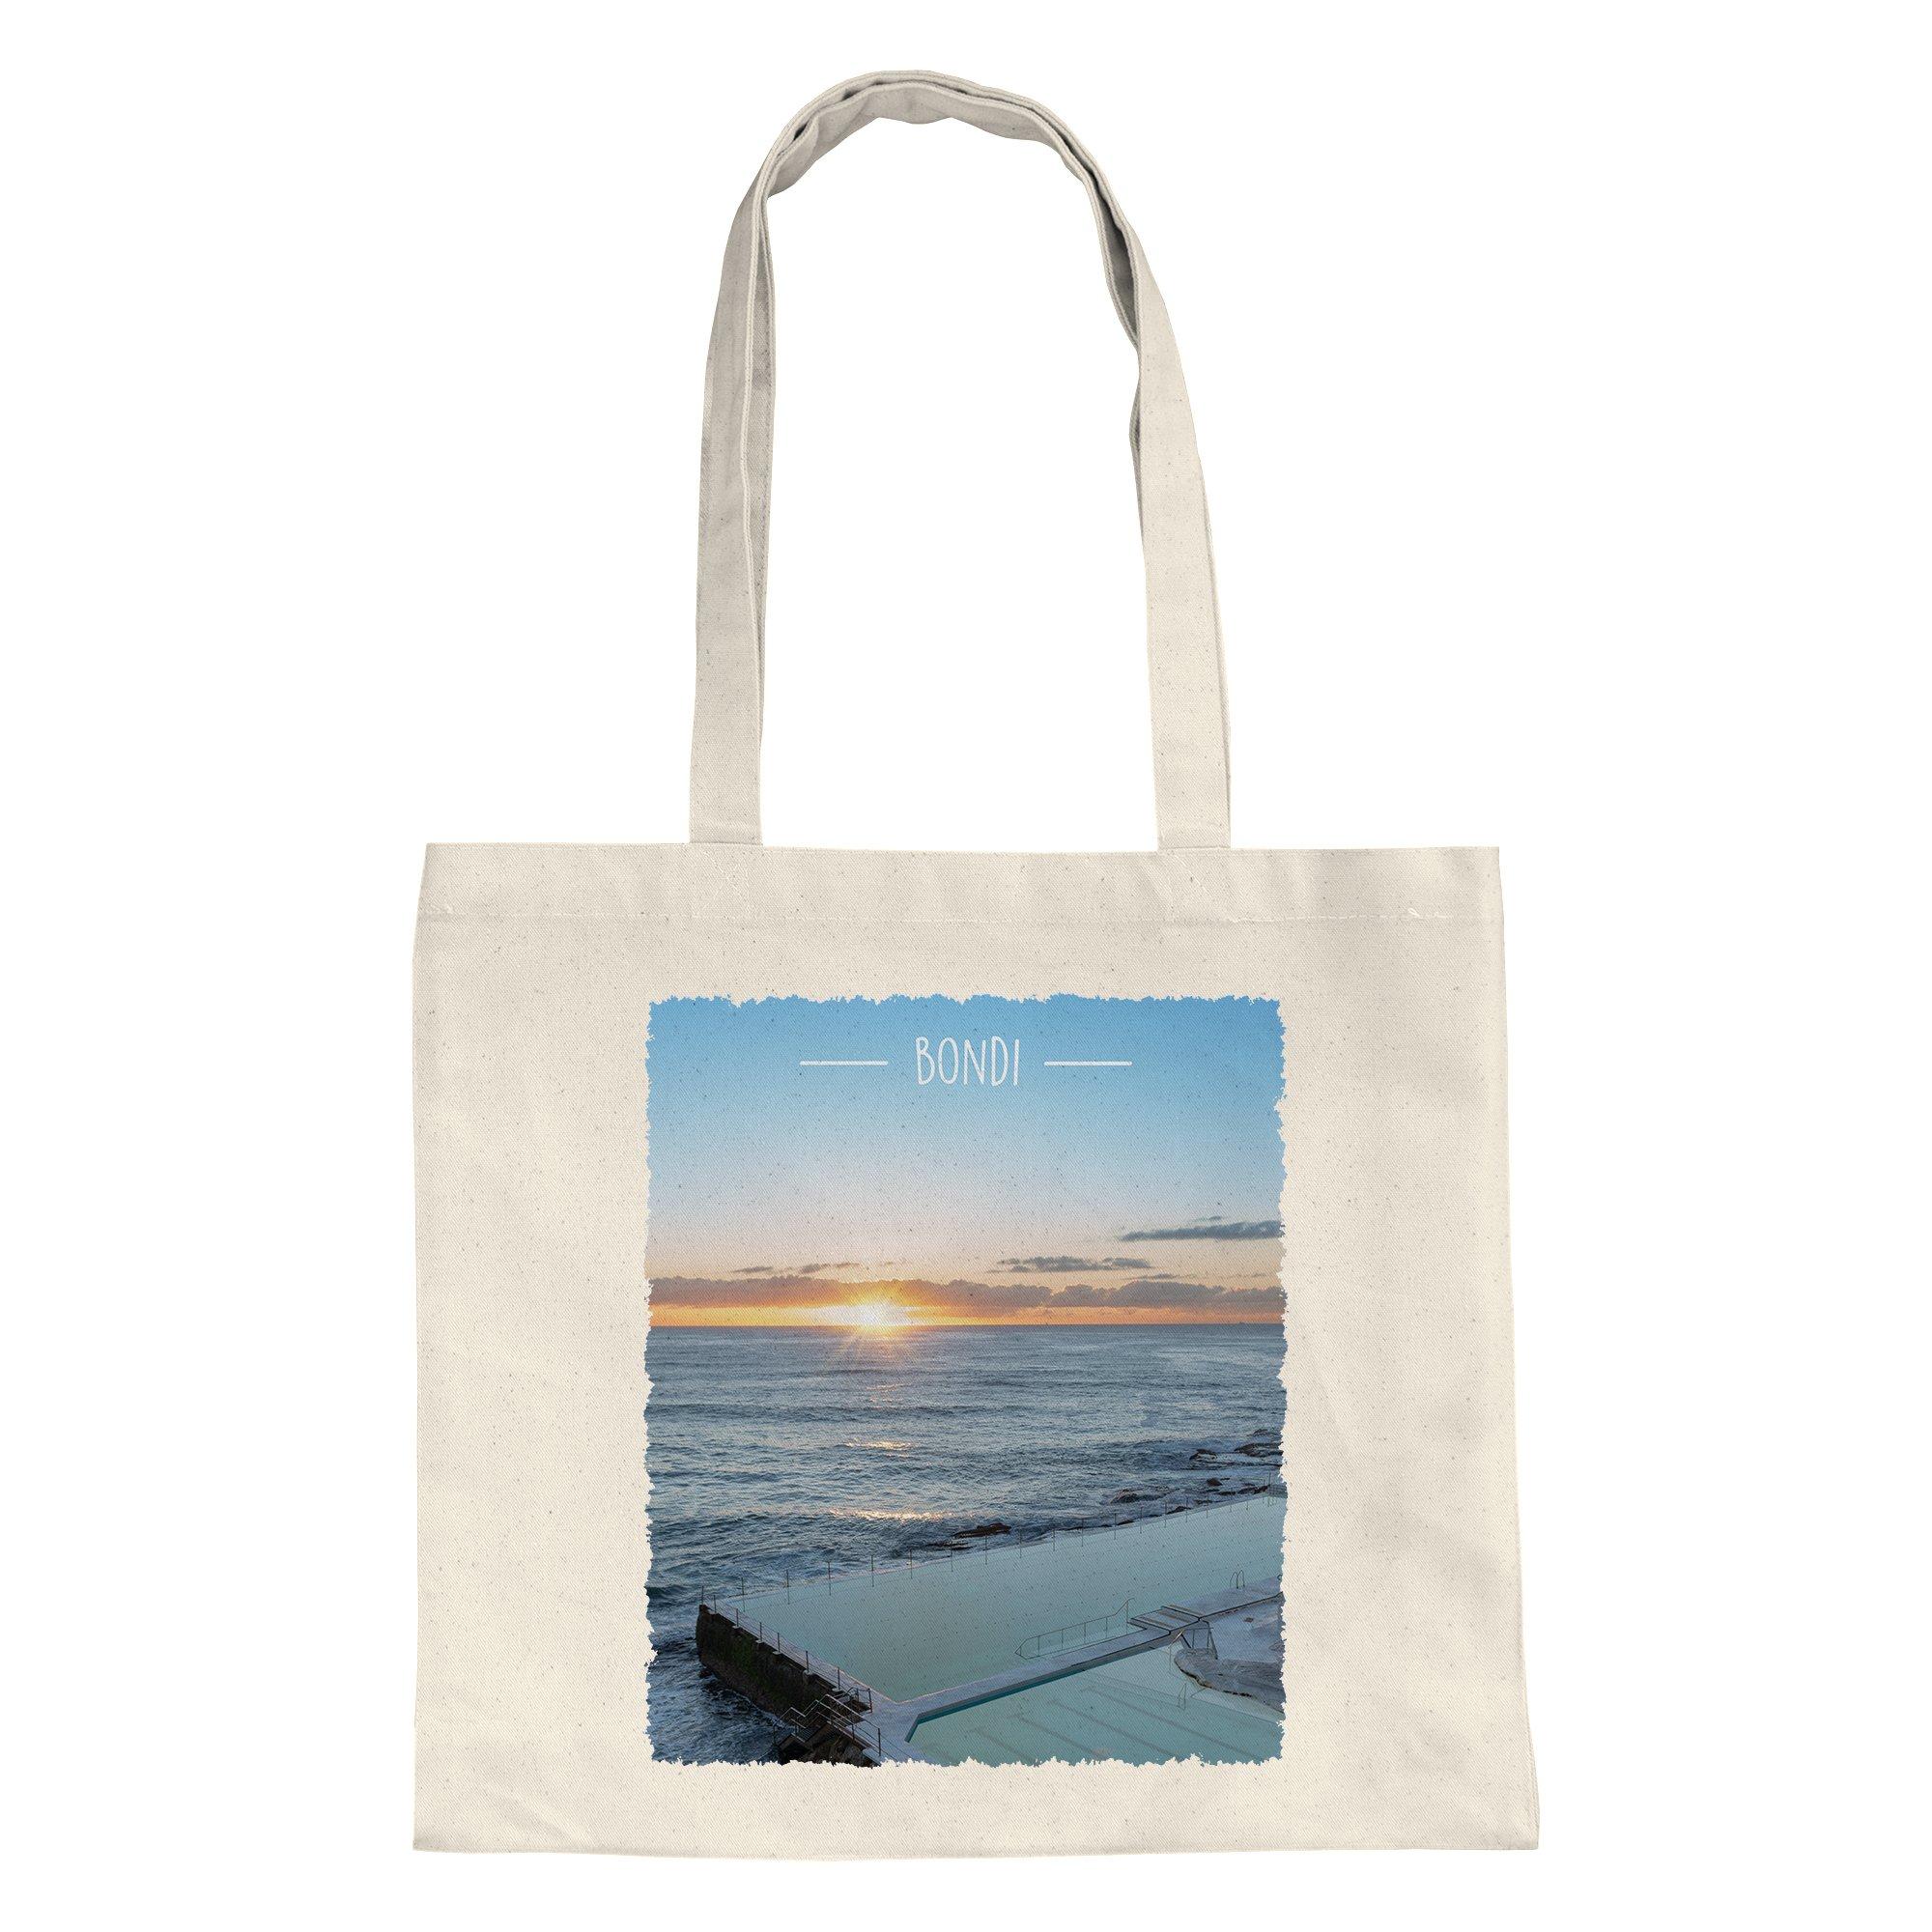 steve-photos-tote-shopping-bag-sunrise-bondi-beach-icebergs-product